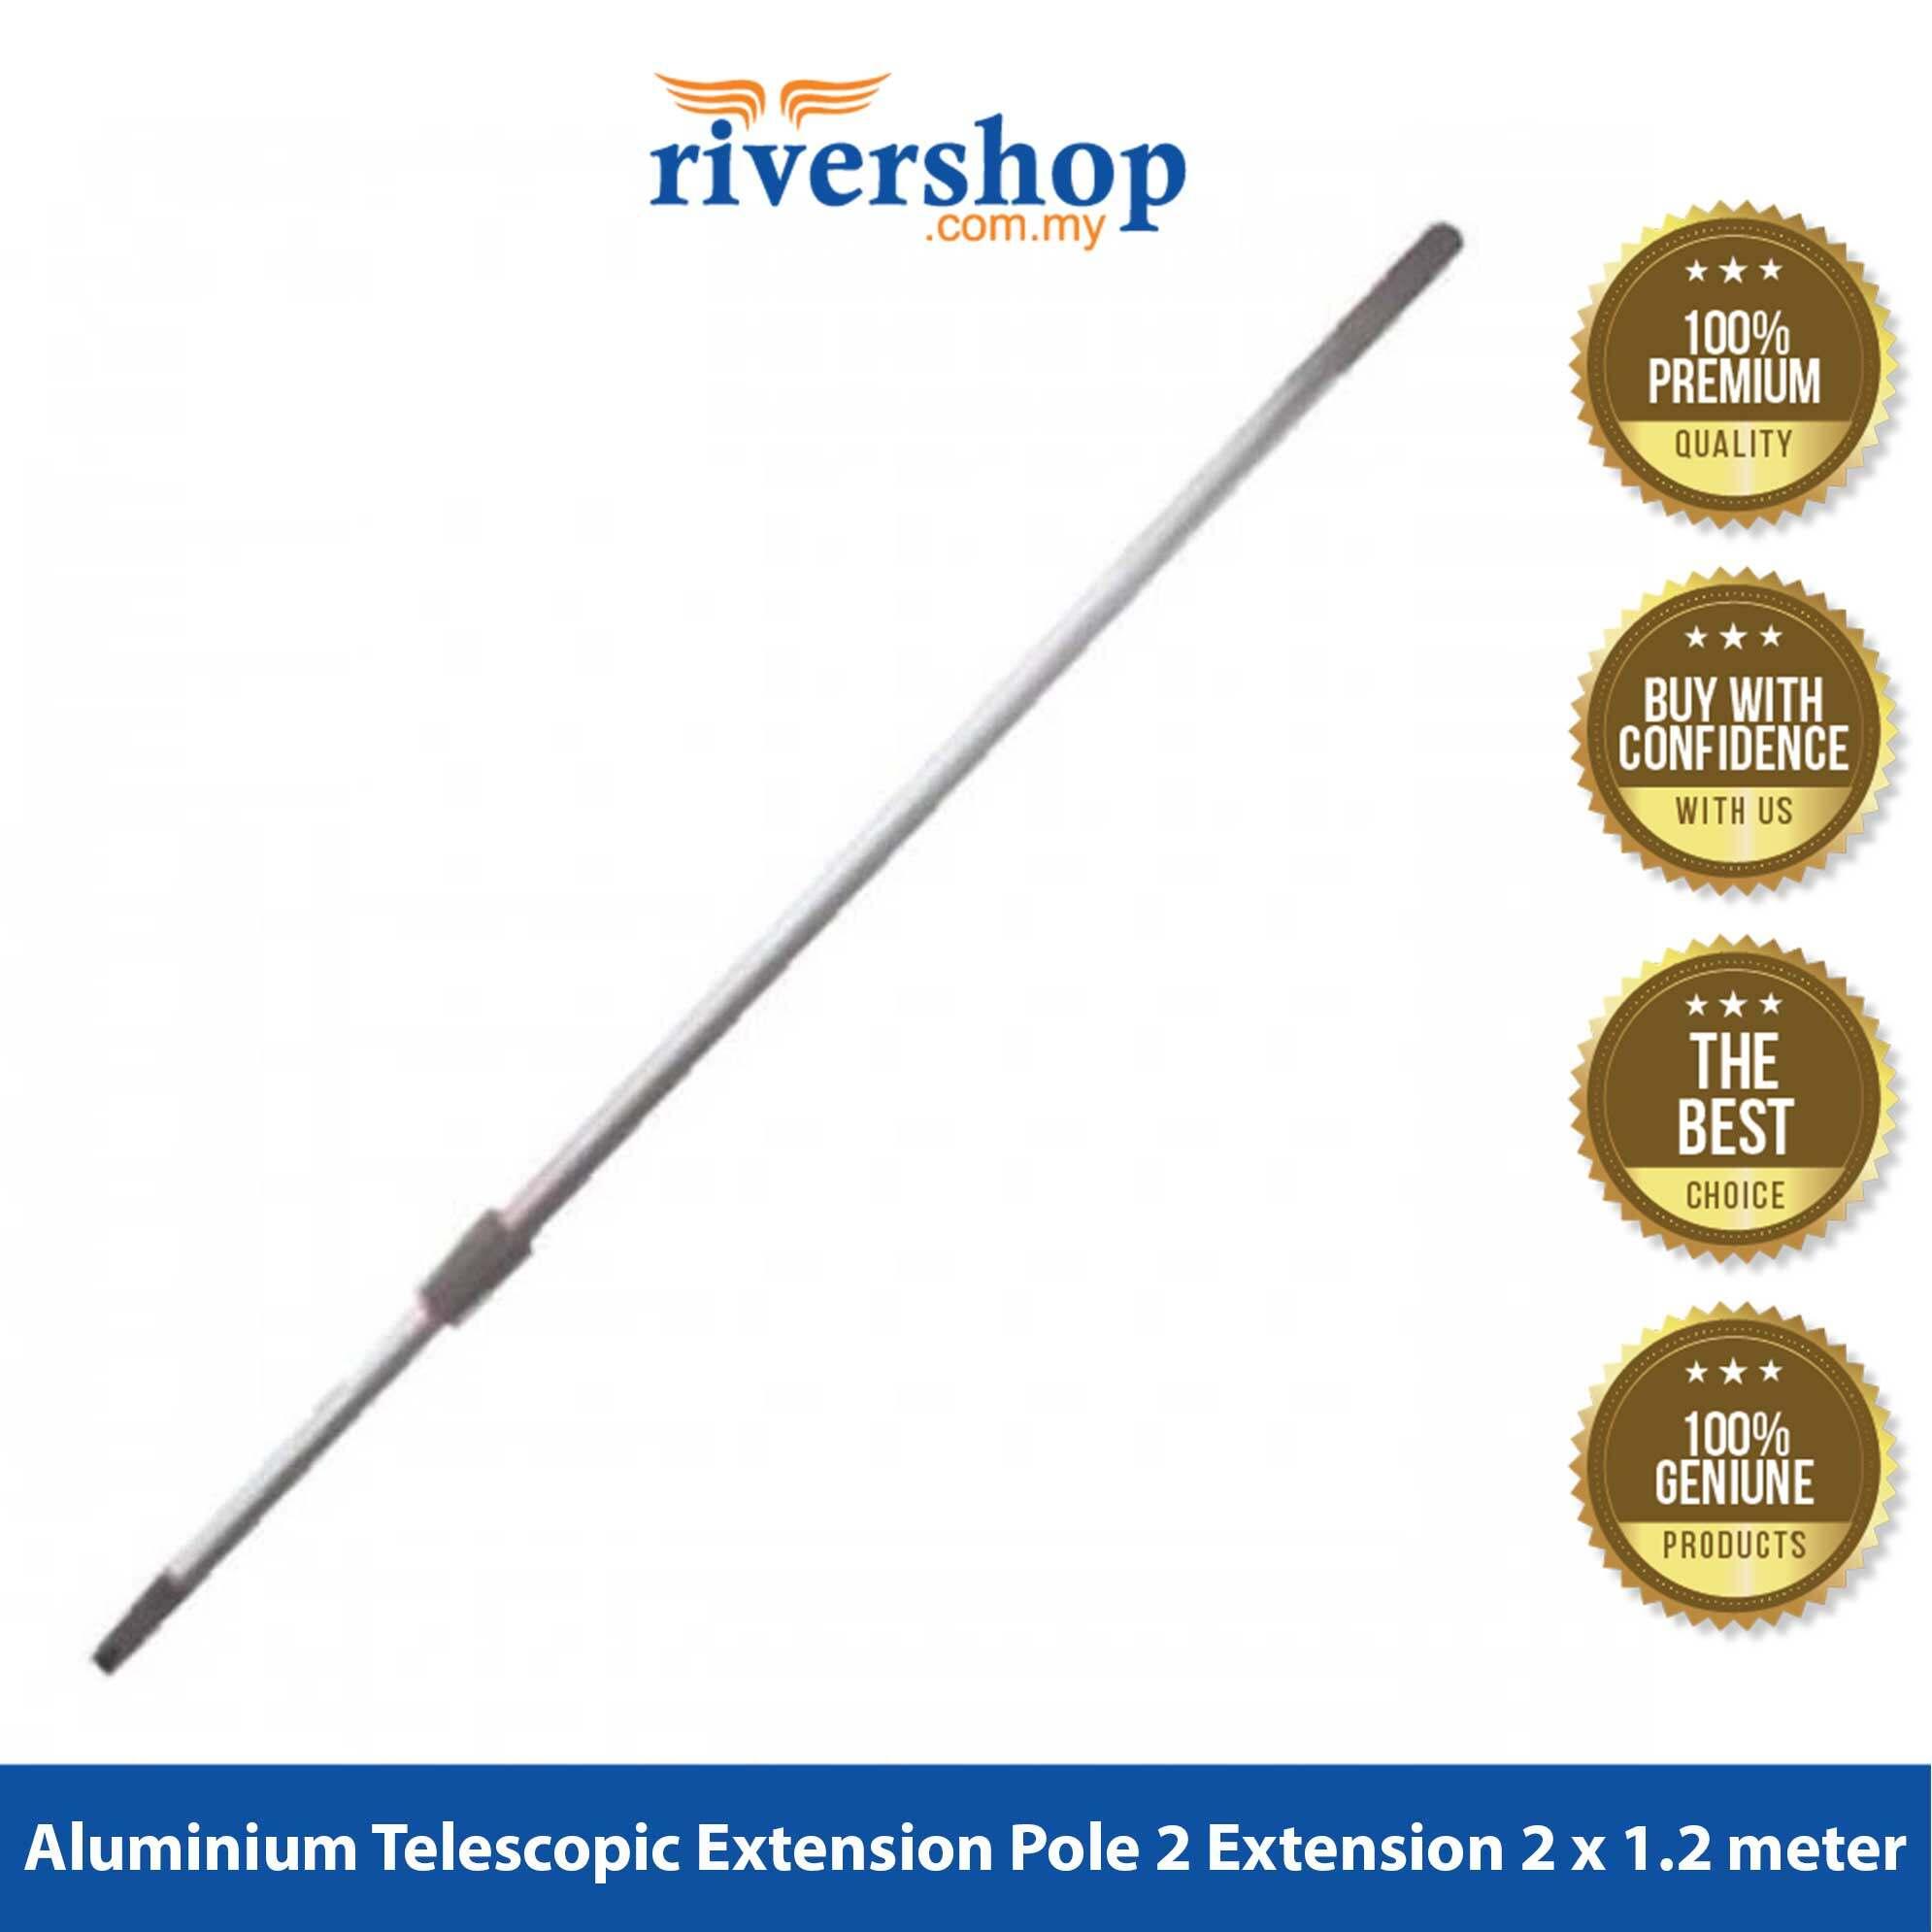 Rivershop 1.2meter Adjustable Aluminium Telescopic Extension Pole